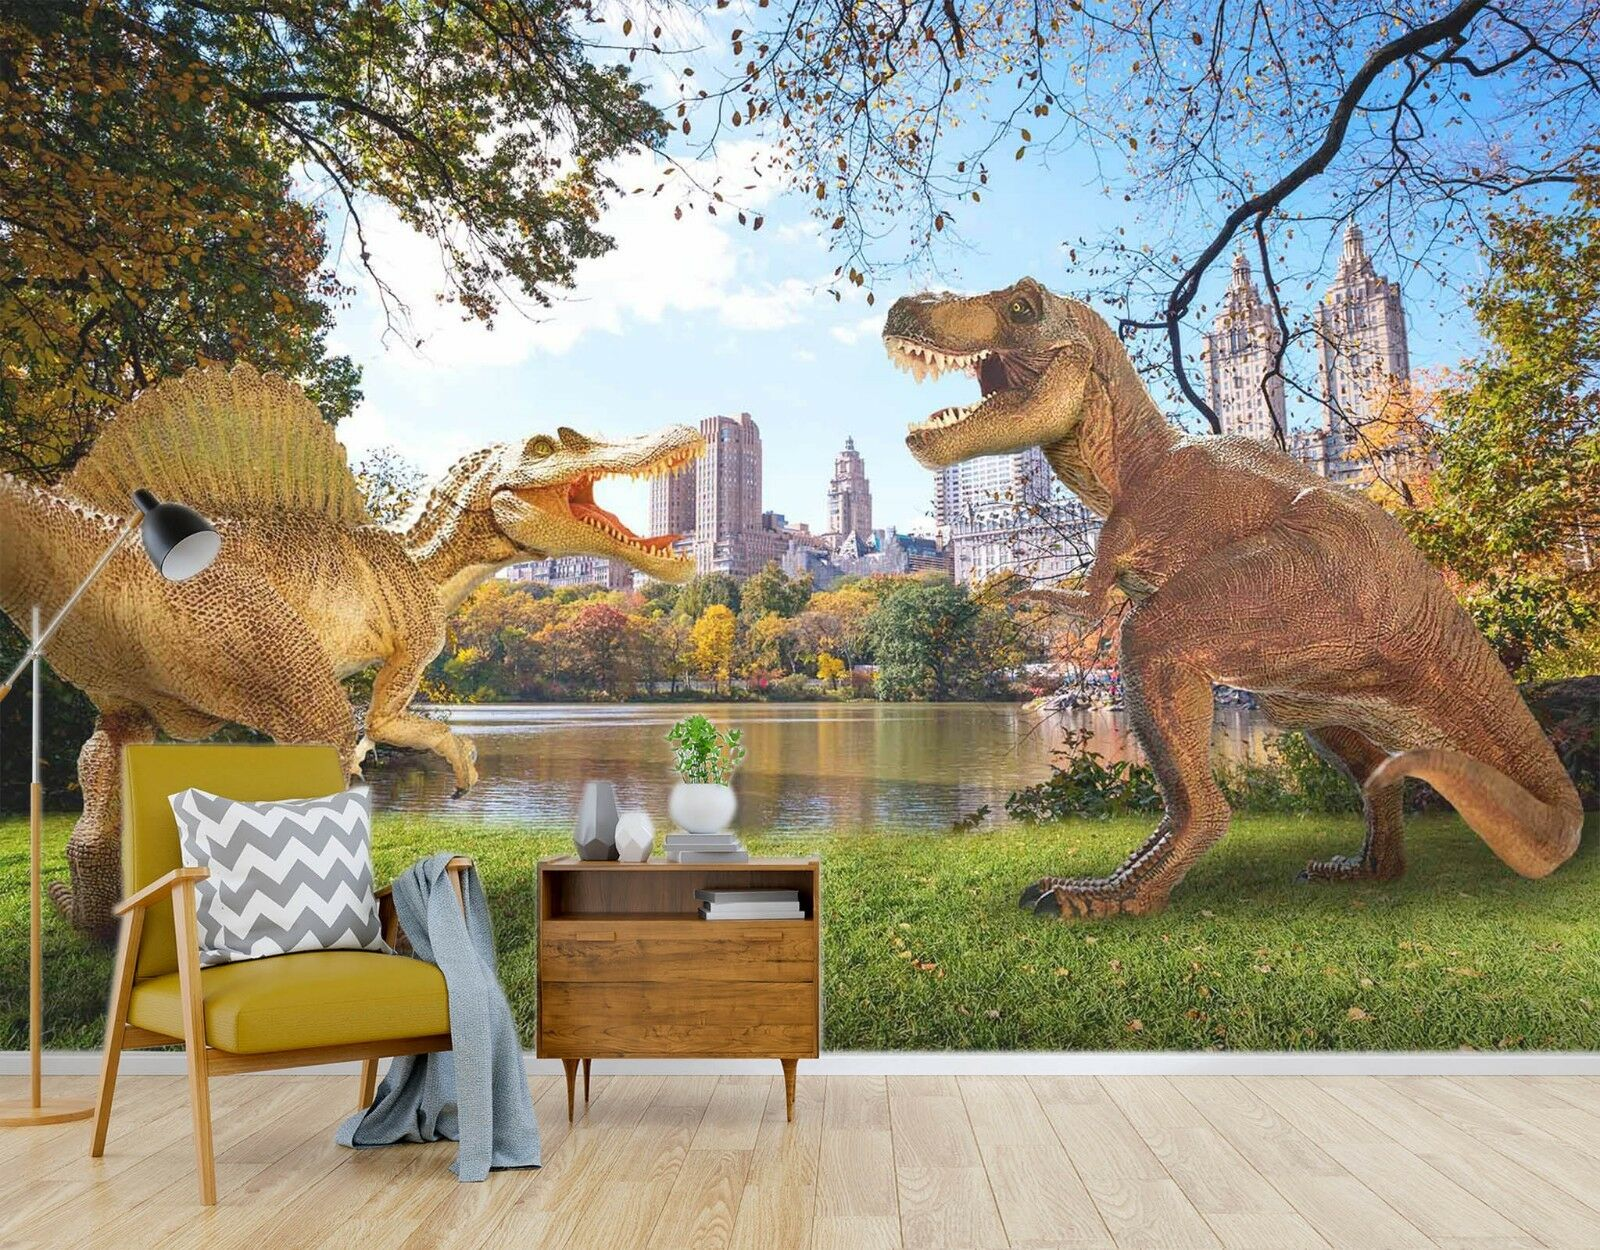 3D City Park Dinosaurs 12 Wallpaper Mural Wall Print Decal Indoor Murals AU